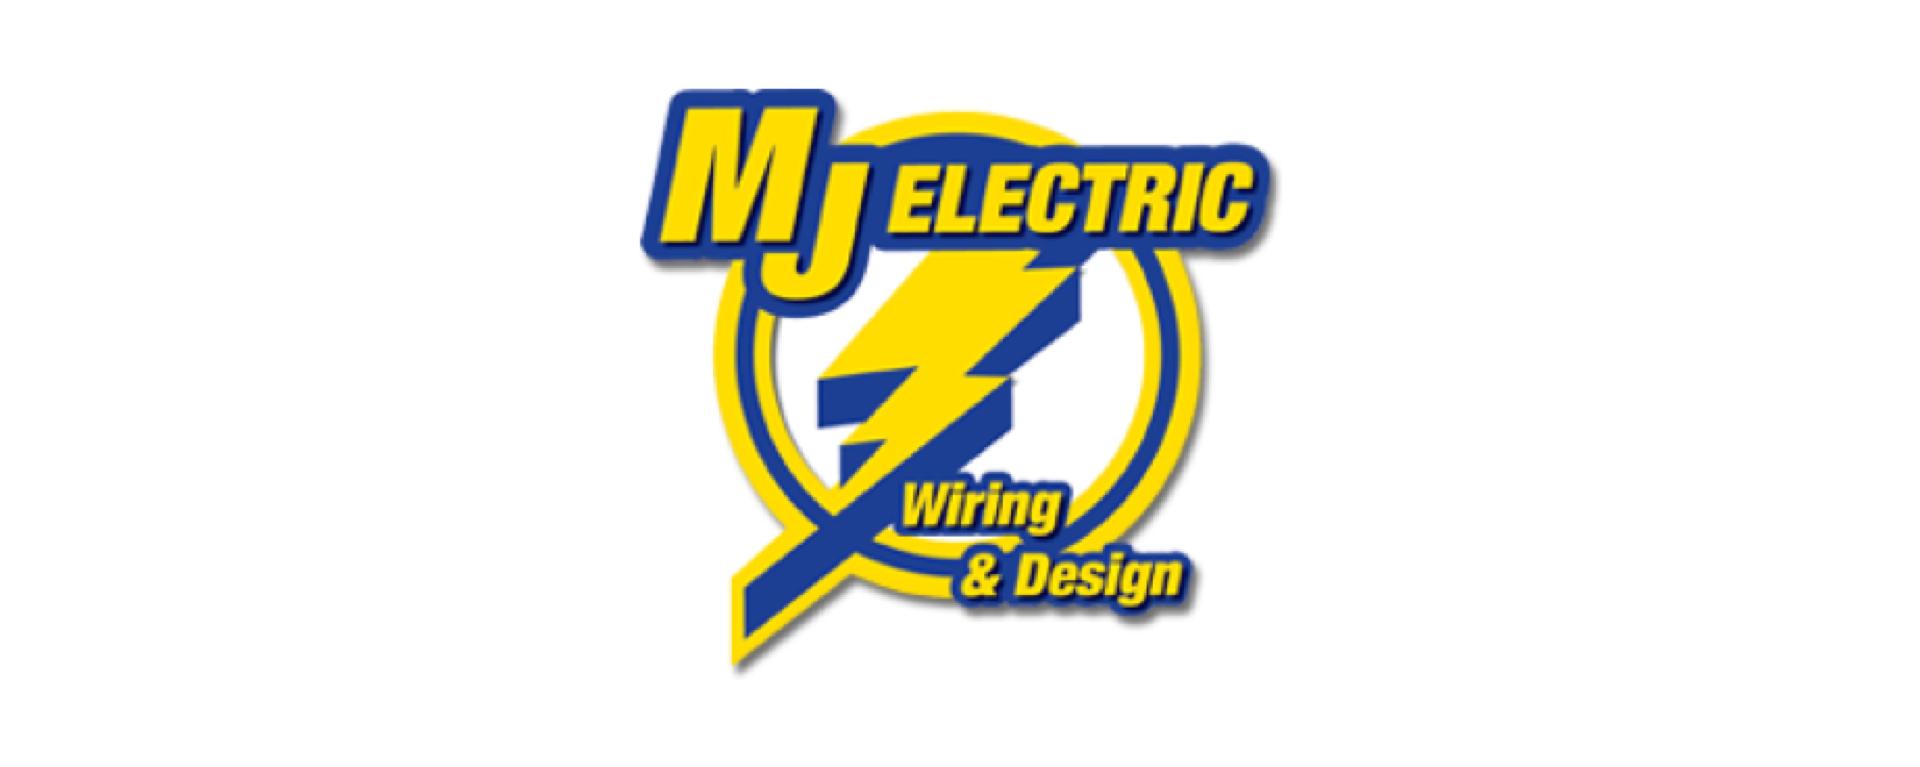 MJ Electric